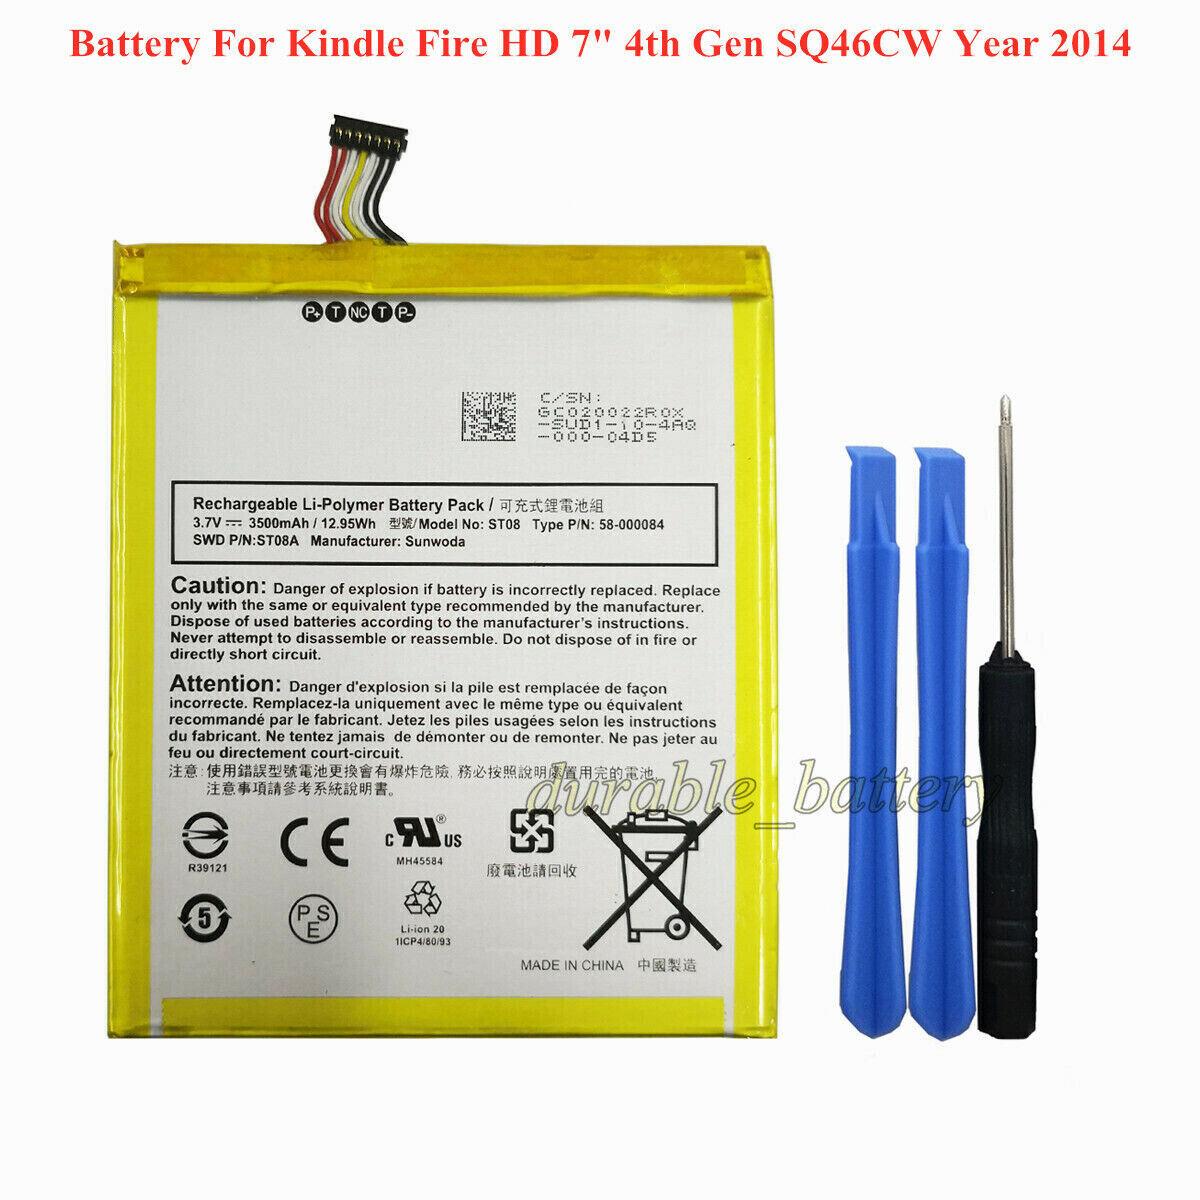 Genuine Battery 58-000084 ST08 Amazon Ki…